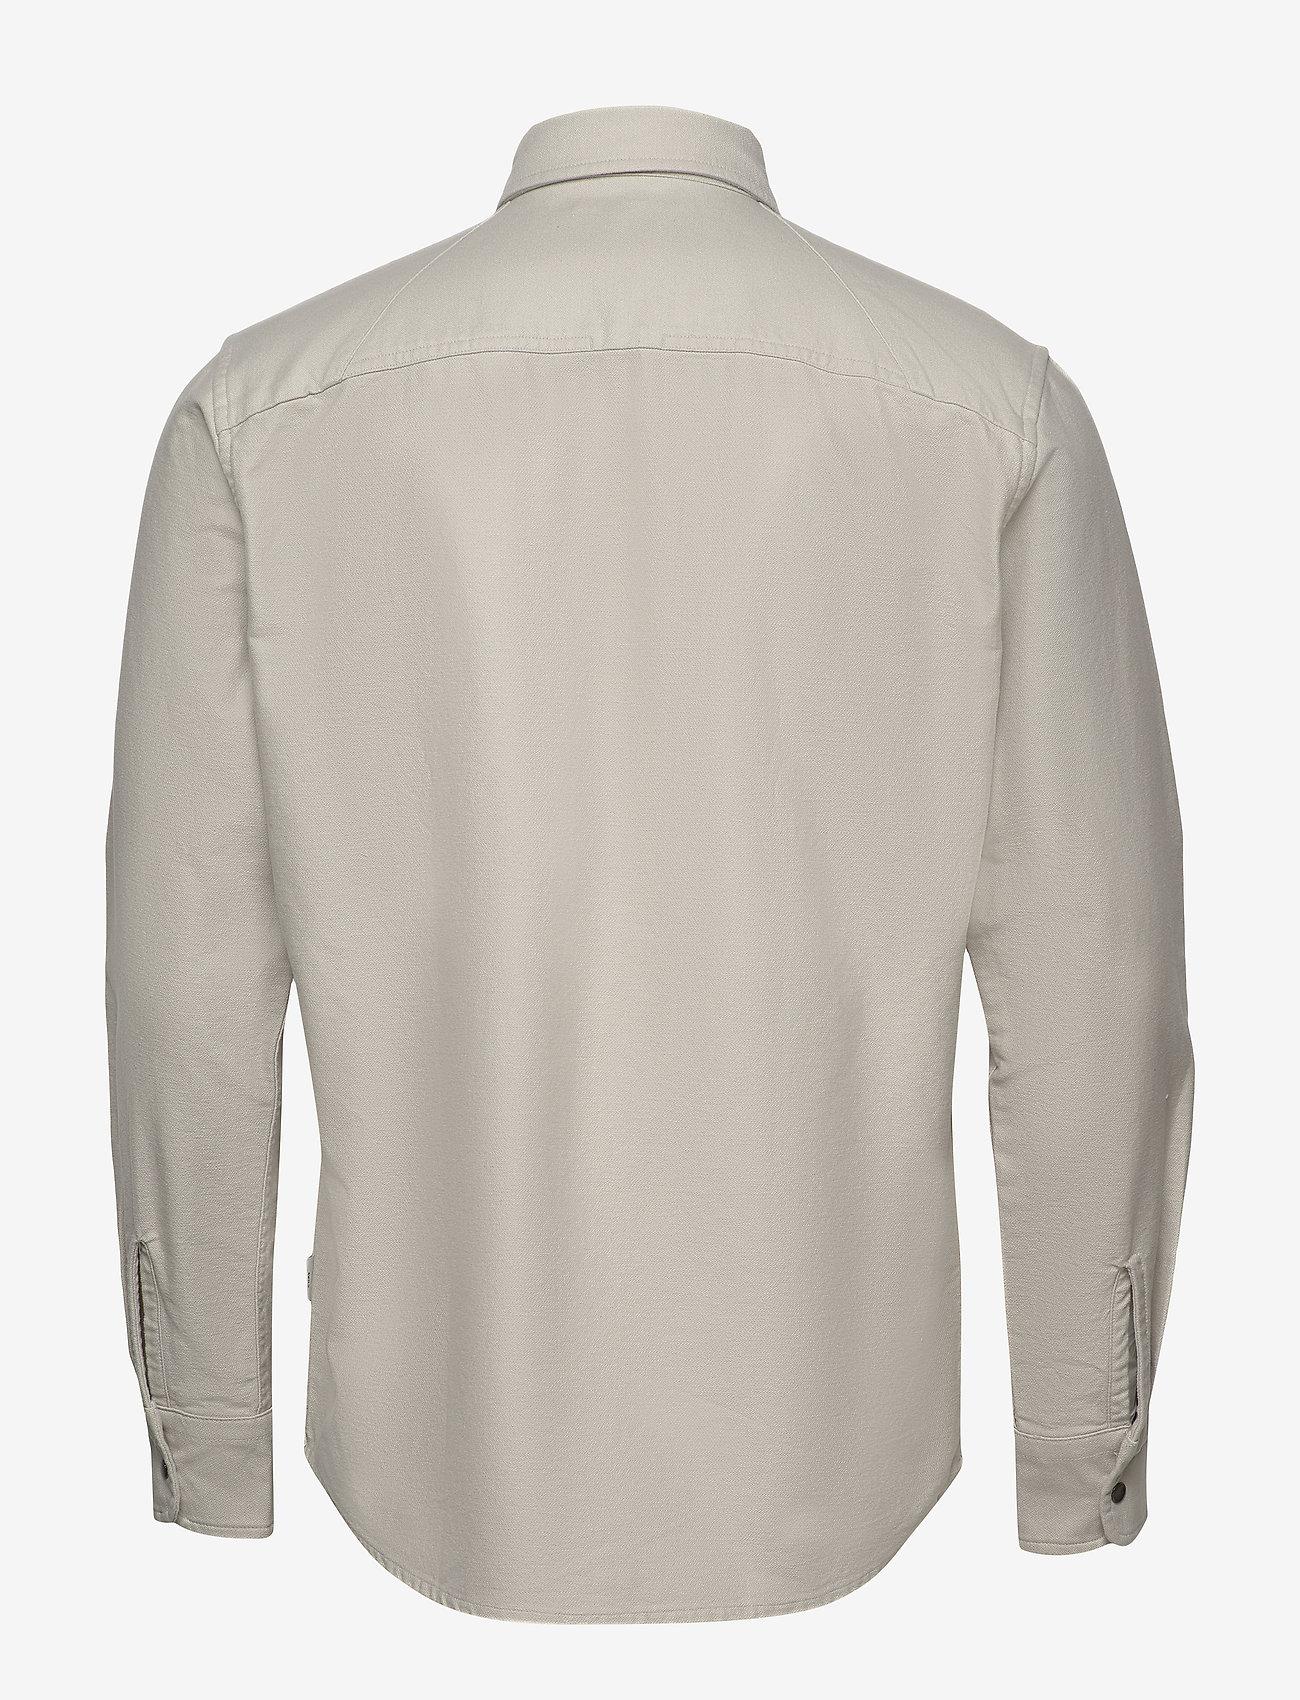 Jack & Jones - JCOPETER DENIM SHIRT LS WORKER - podstawowe koszulki - glacier gray - 1